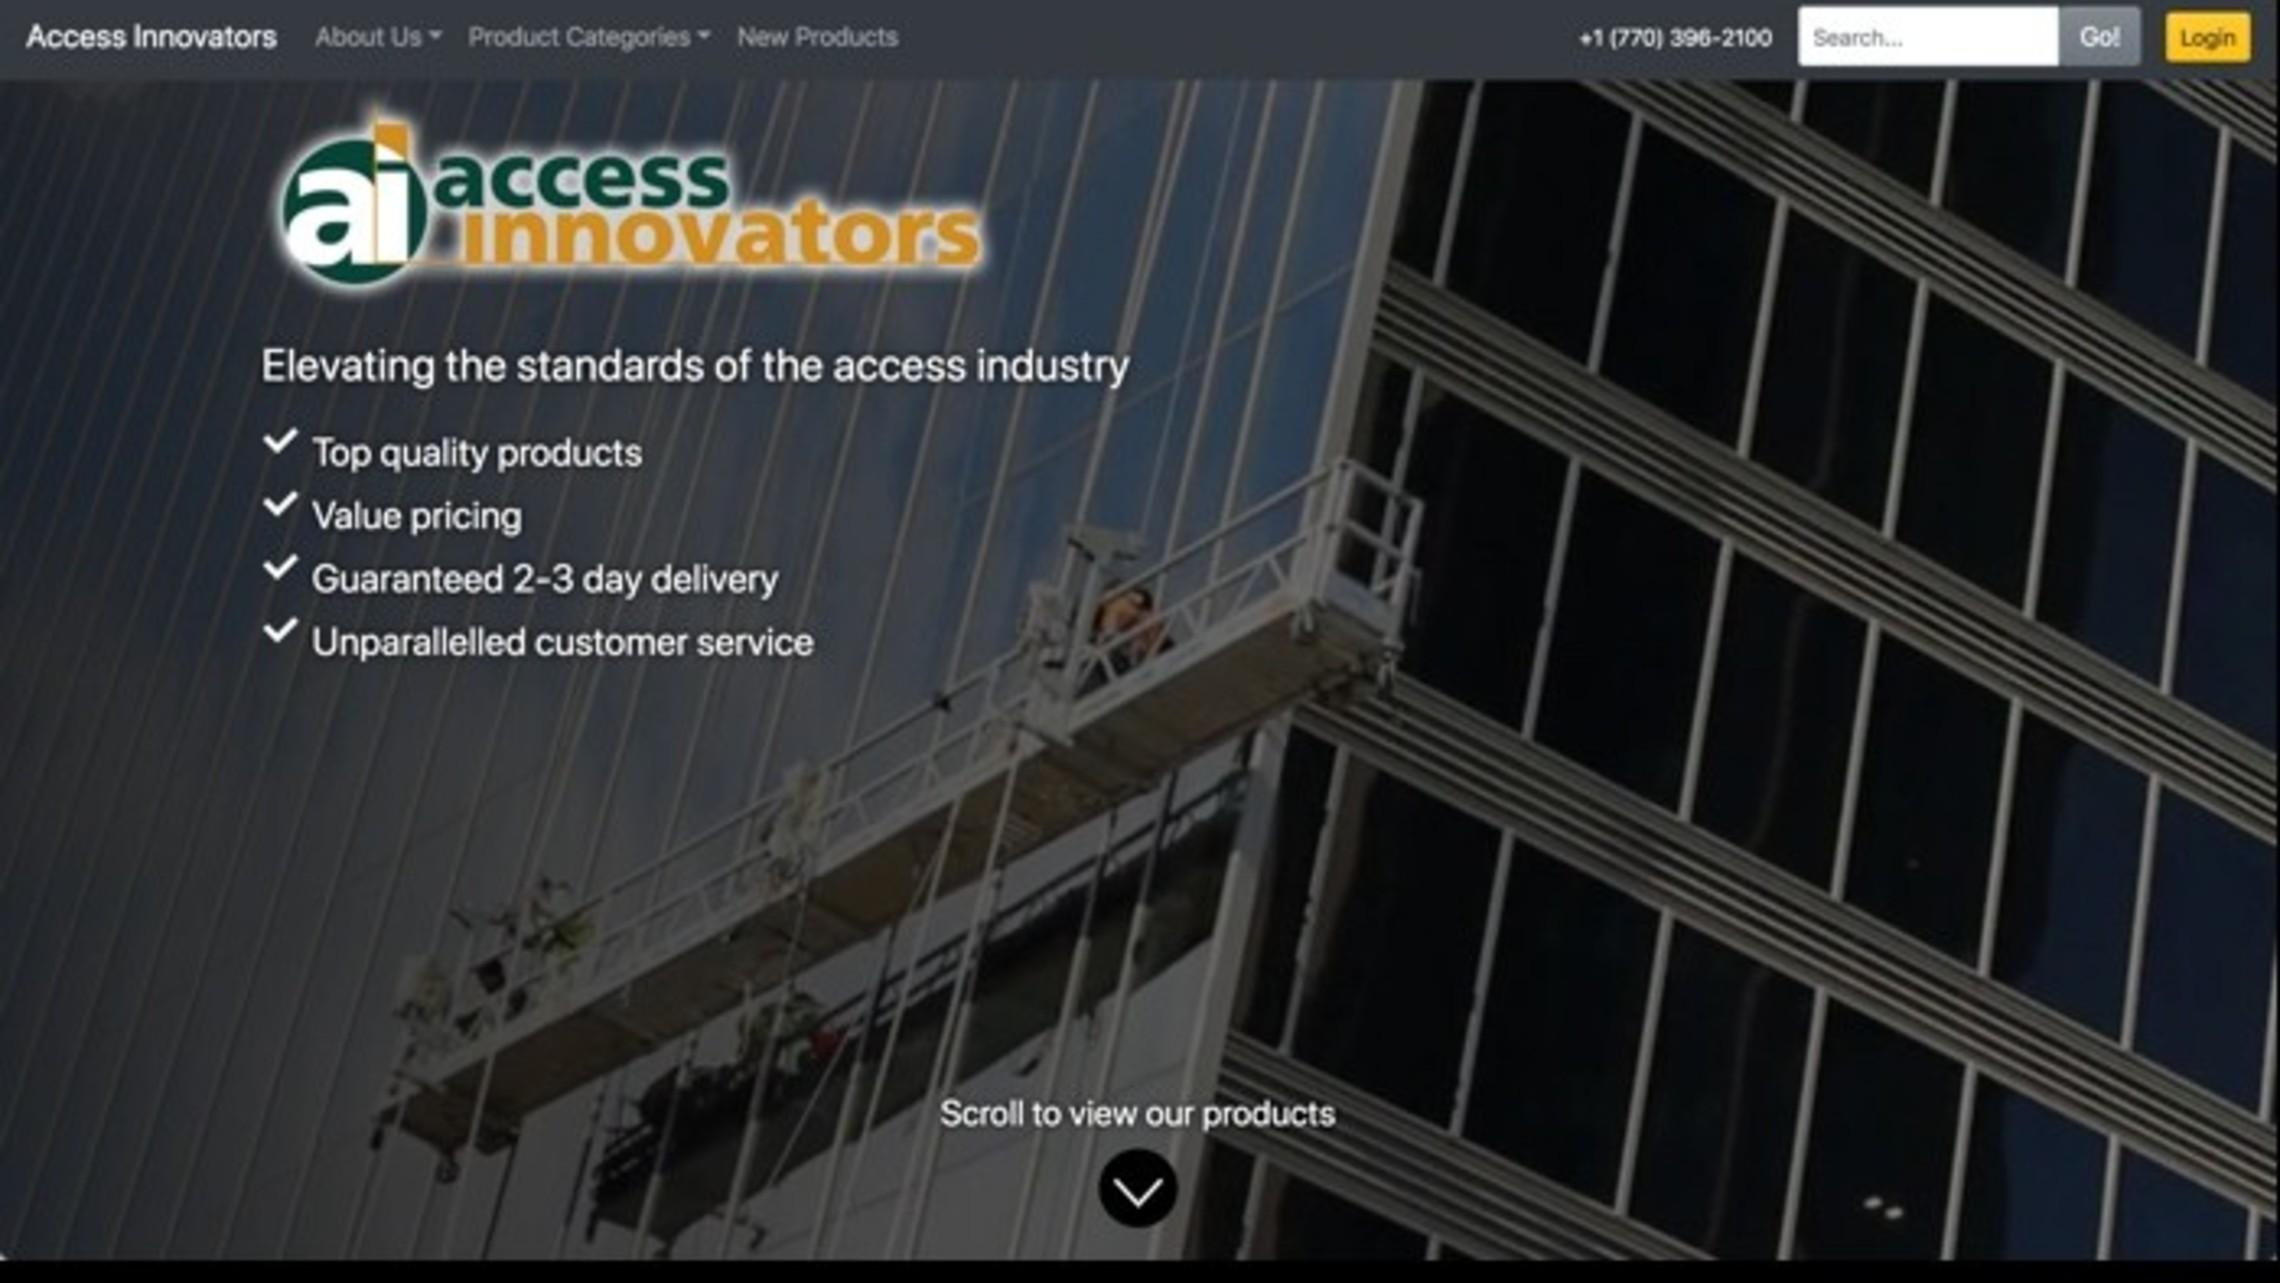 Access Innovators